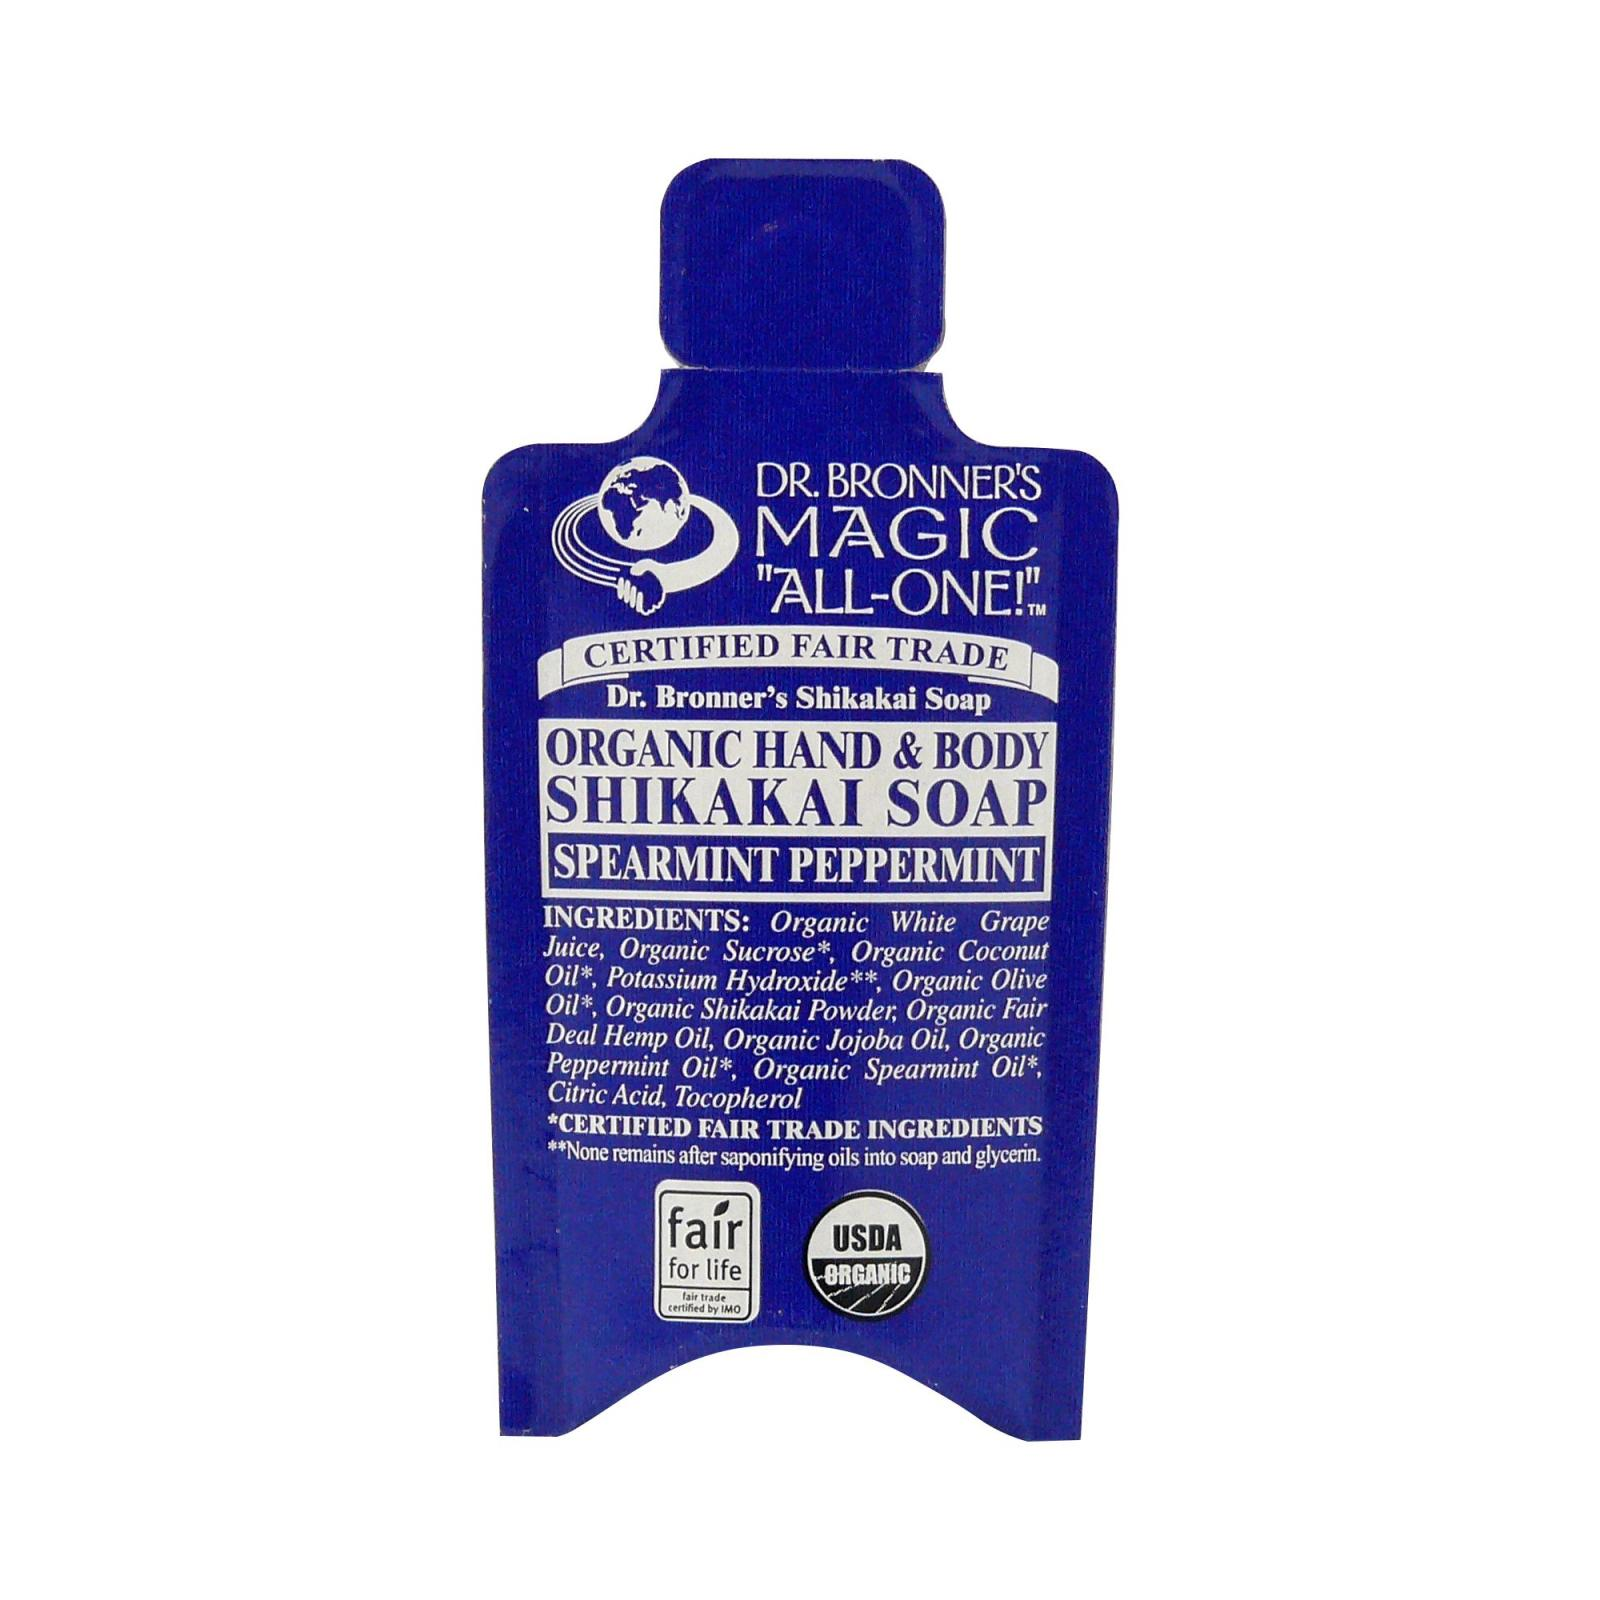 Dr. Bronner's Tekuté mýdlo na tělo i vlasy Shikakai, Spearmint-Peppermint 10 ml